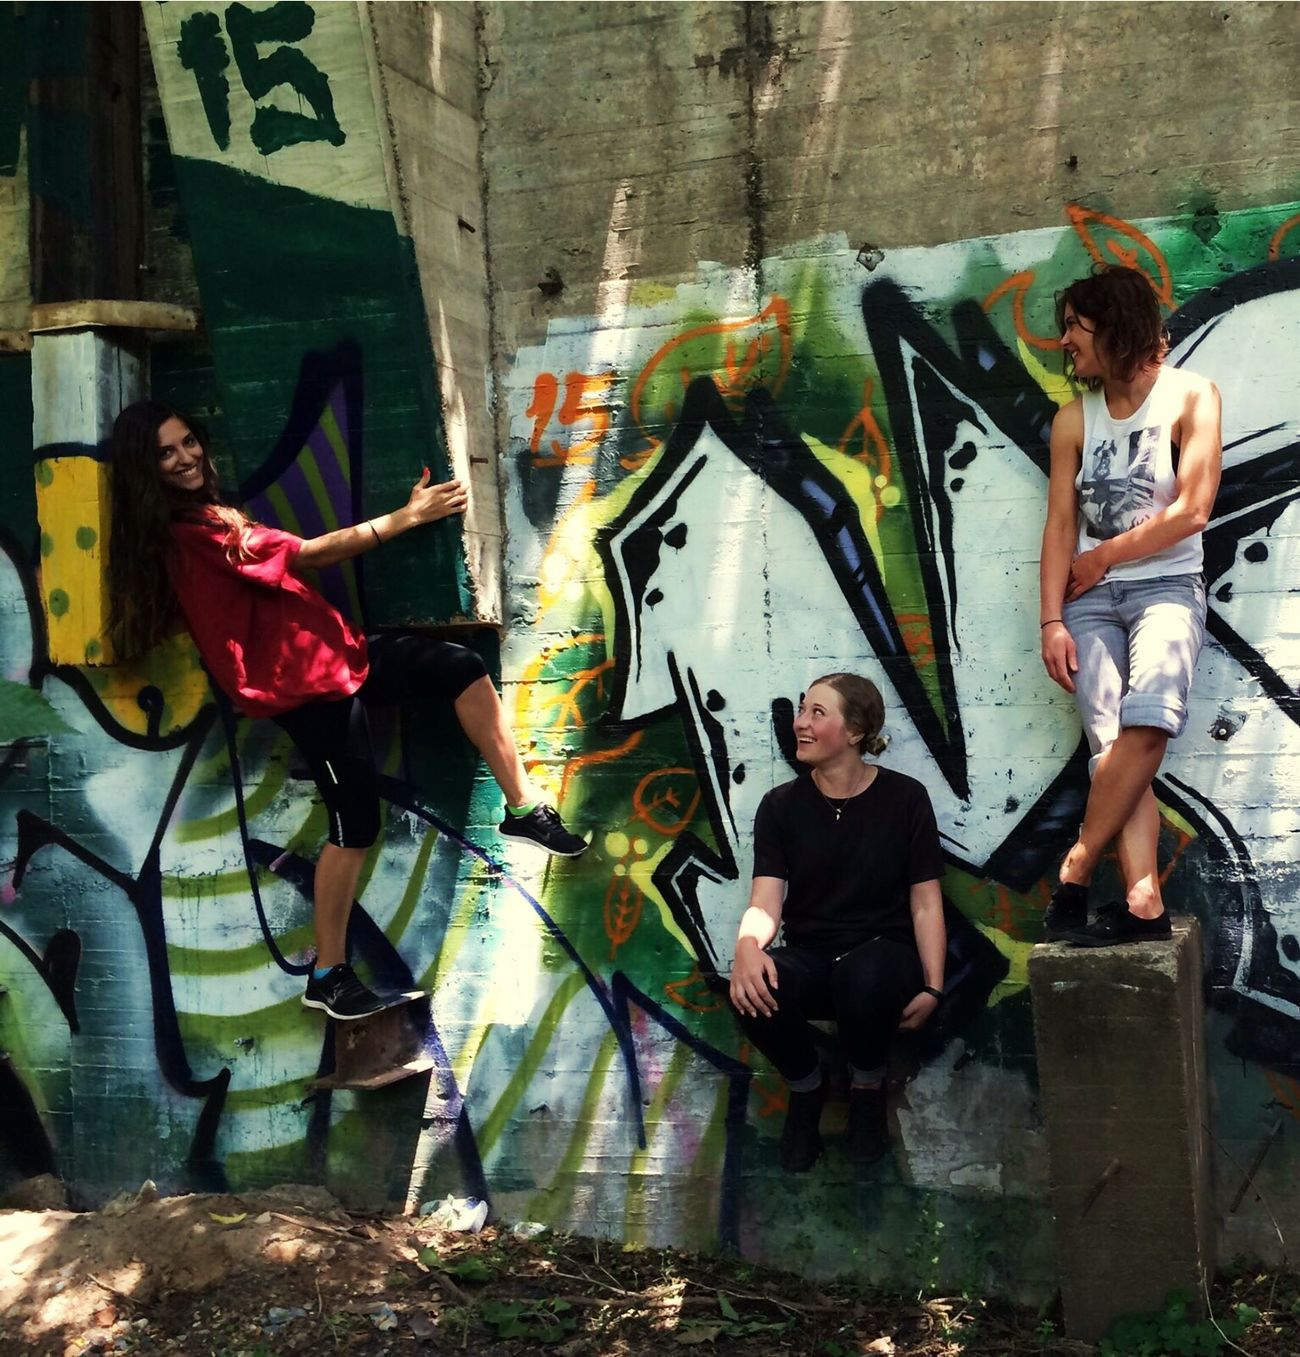 It never rains... SoCal Southern California California Love Graffiti Street Street Art/Graffiti Friendship Creativity Friends Real People Urban Landscape Urban Exploration Happy People NEM Street AMPt - Street Gangsters Paradise Hangout